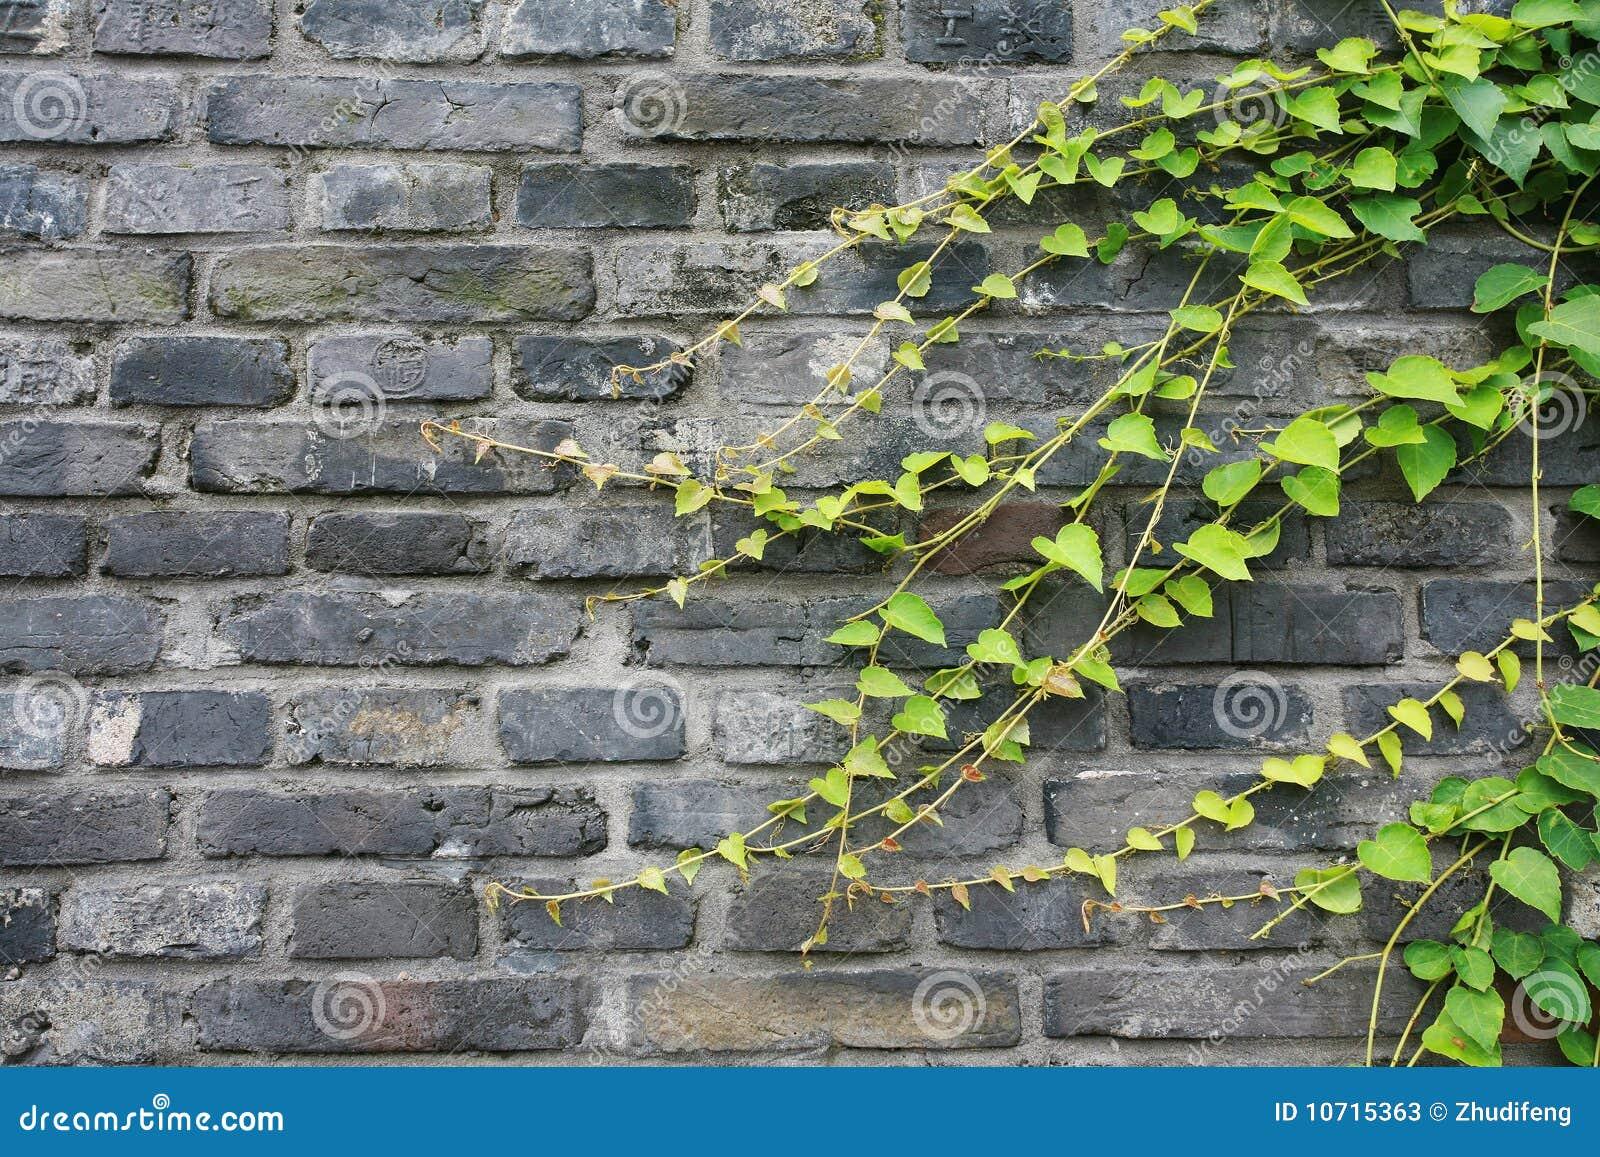 vines on brick wall stock photos image 10715363. Black Bedroom Furniture Sets. Home Design Ideas